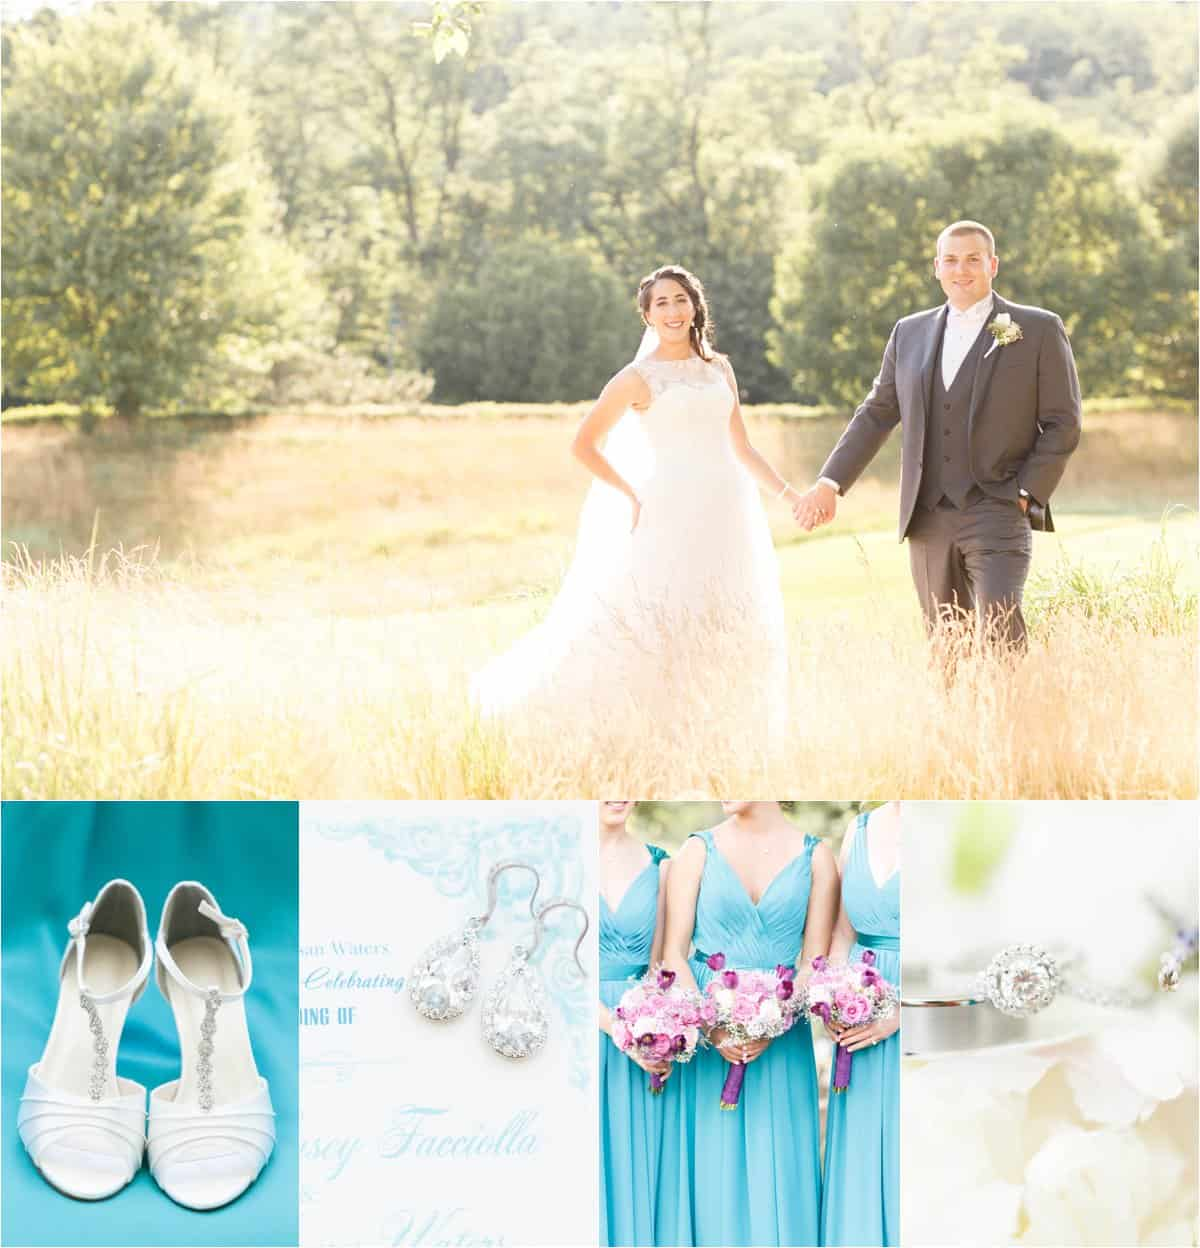 jericho national golf club new hope pennsylvania wedding photos